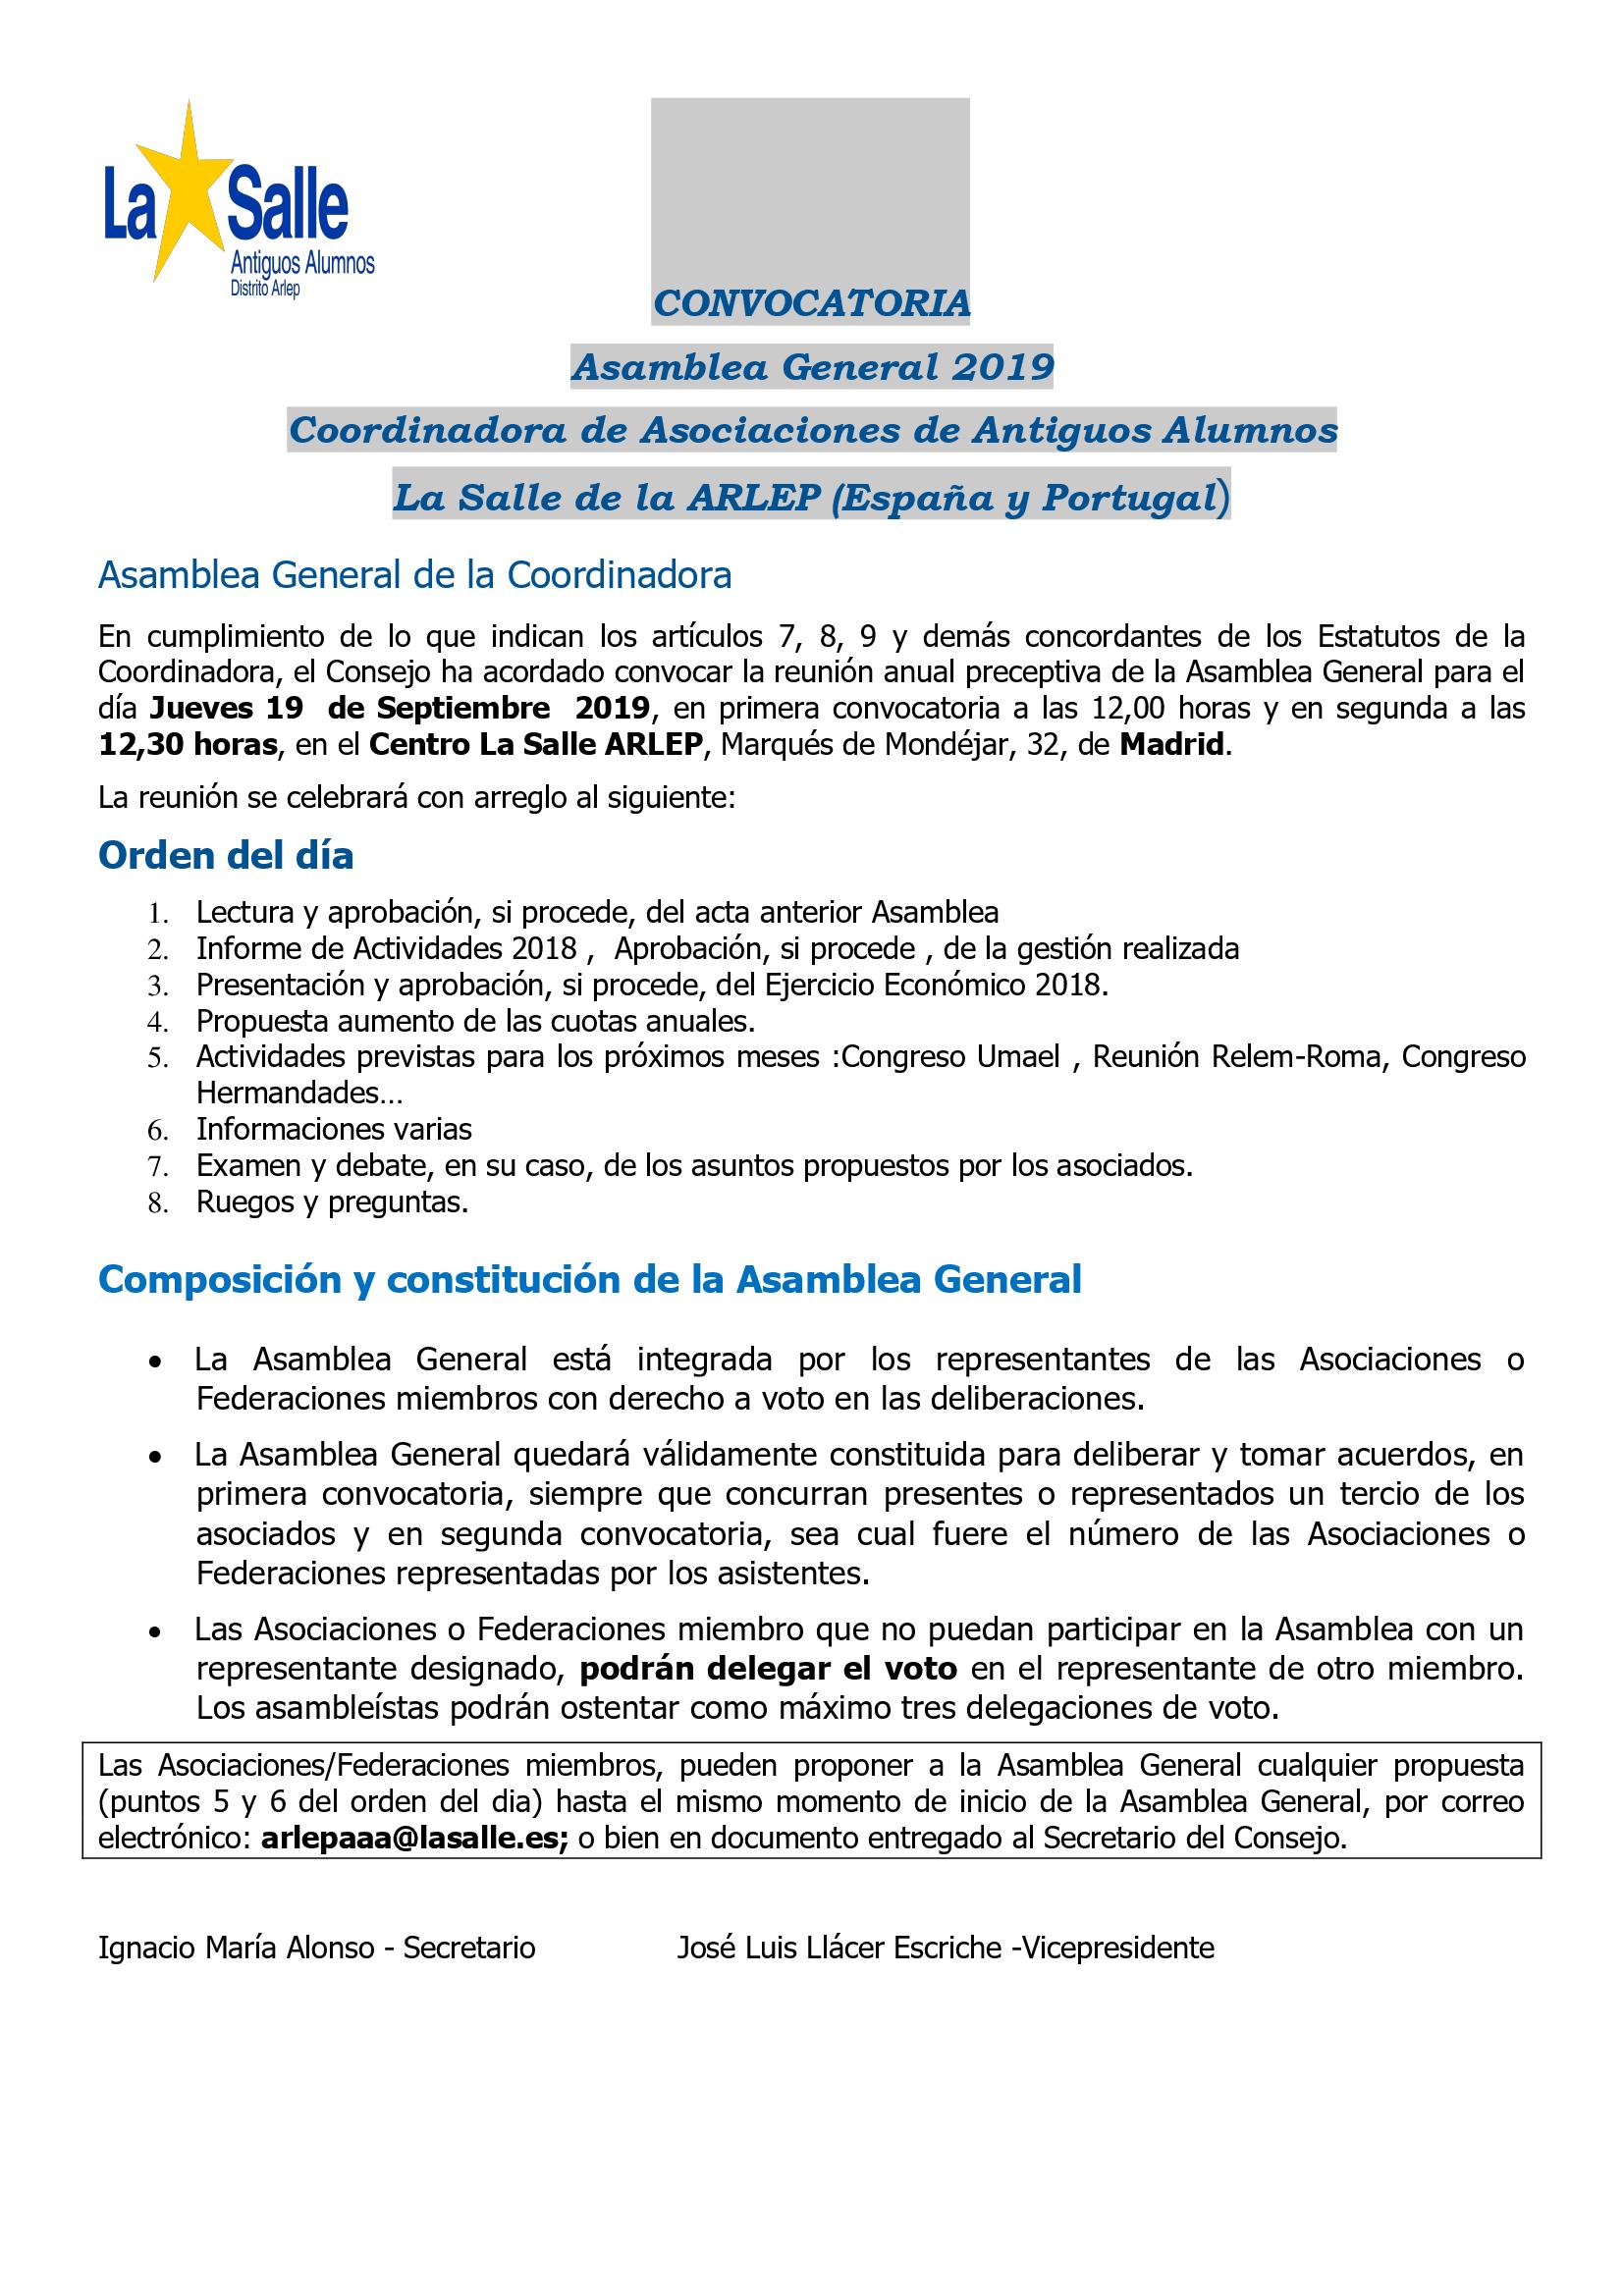 CONVOCATORIA ASAMBLEA AA.AA SALLE ARLEP (ESPAÑA Y PORTUGAL)